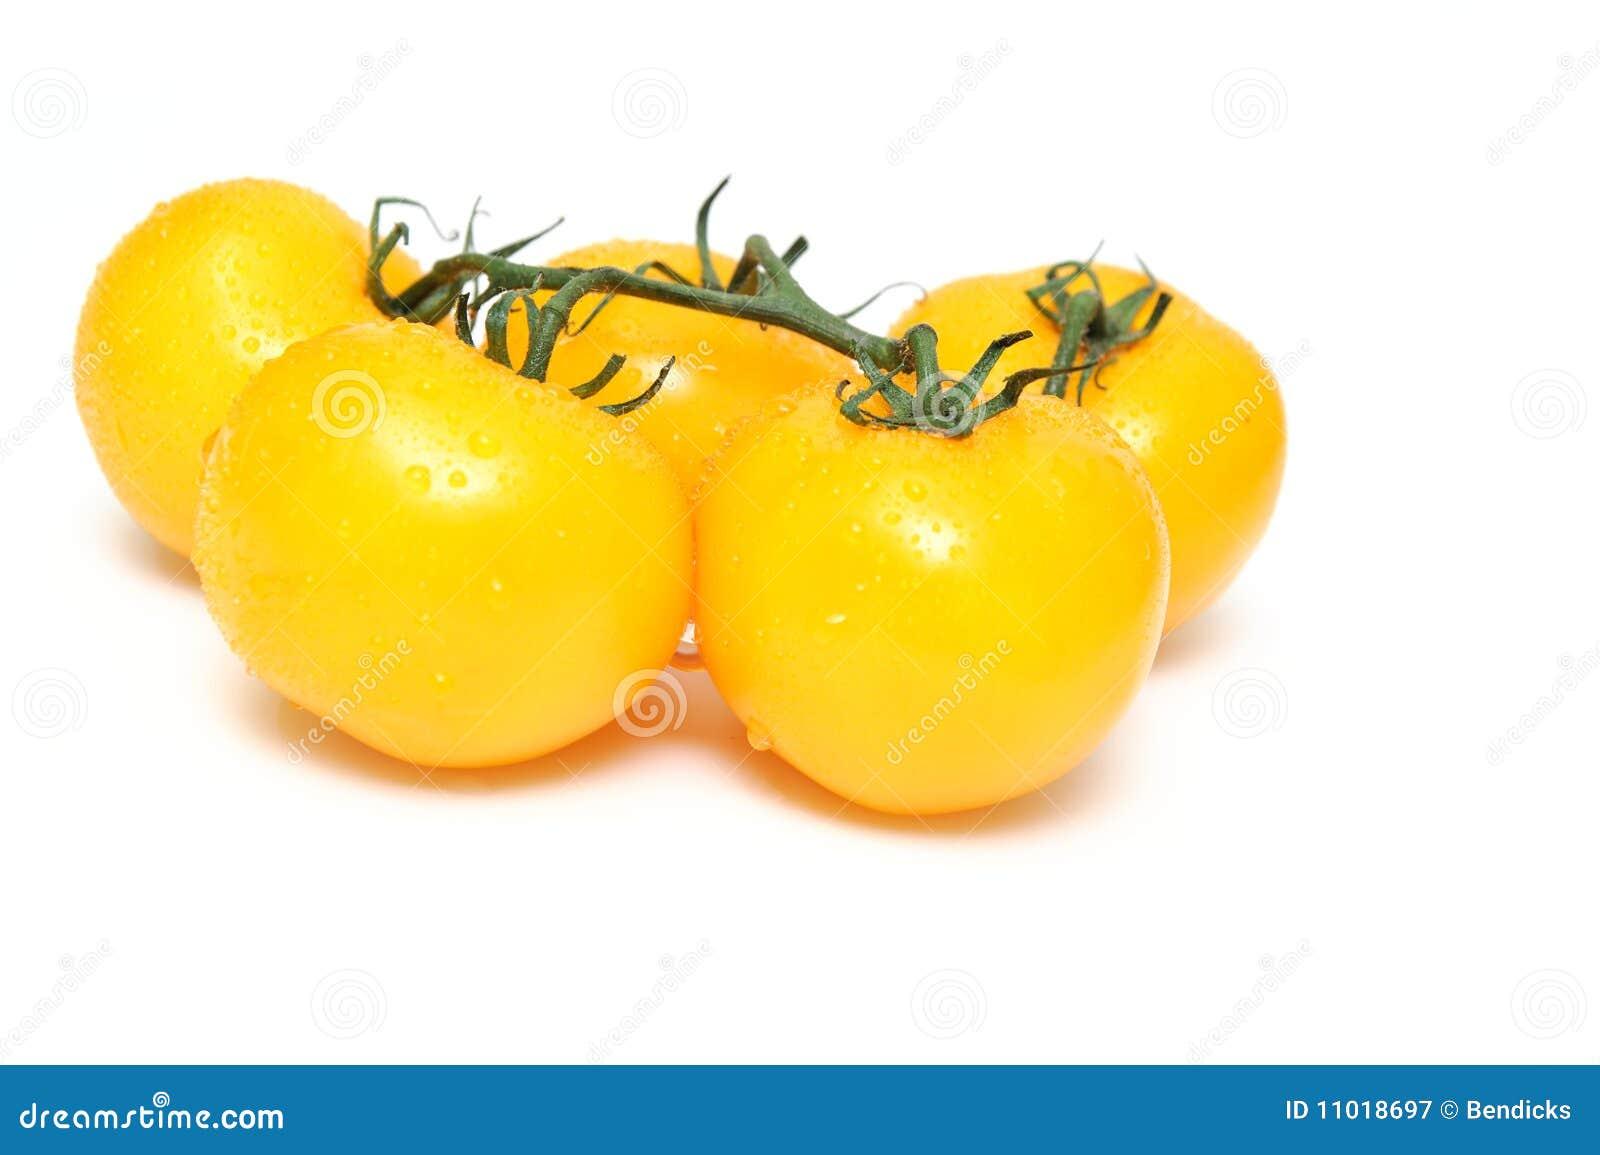 yellow heirloom tomatoes - photo #49